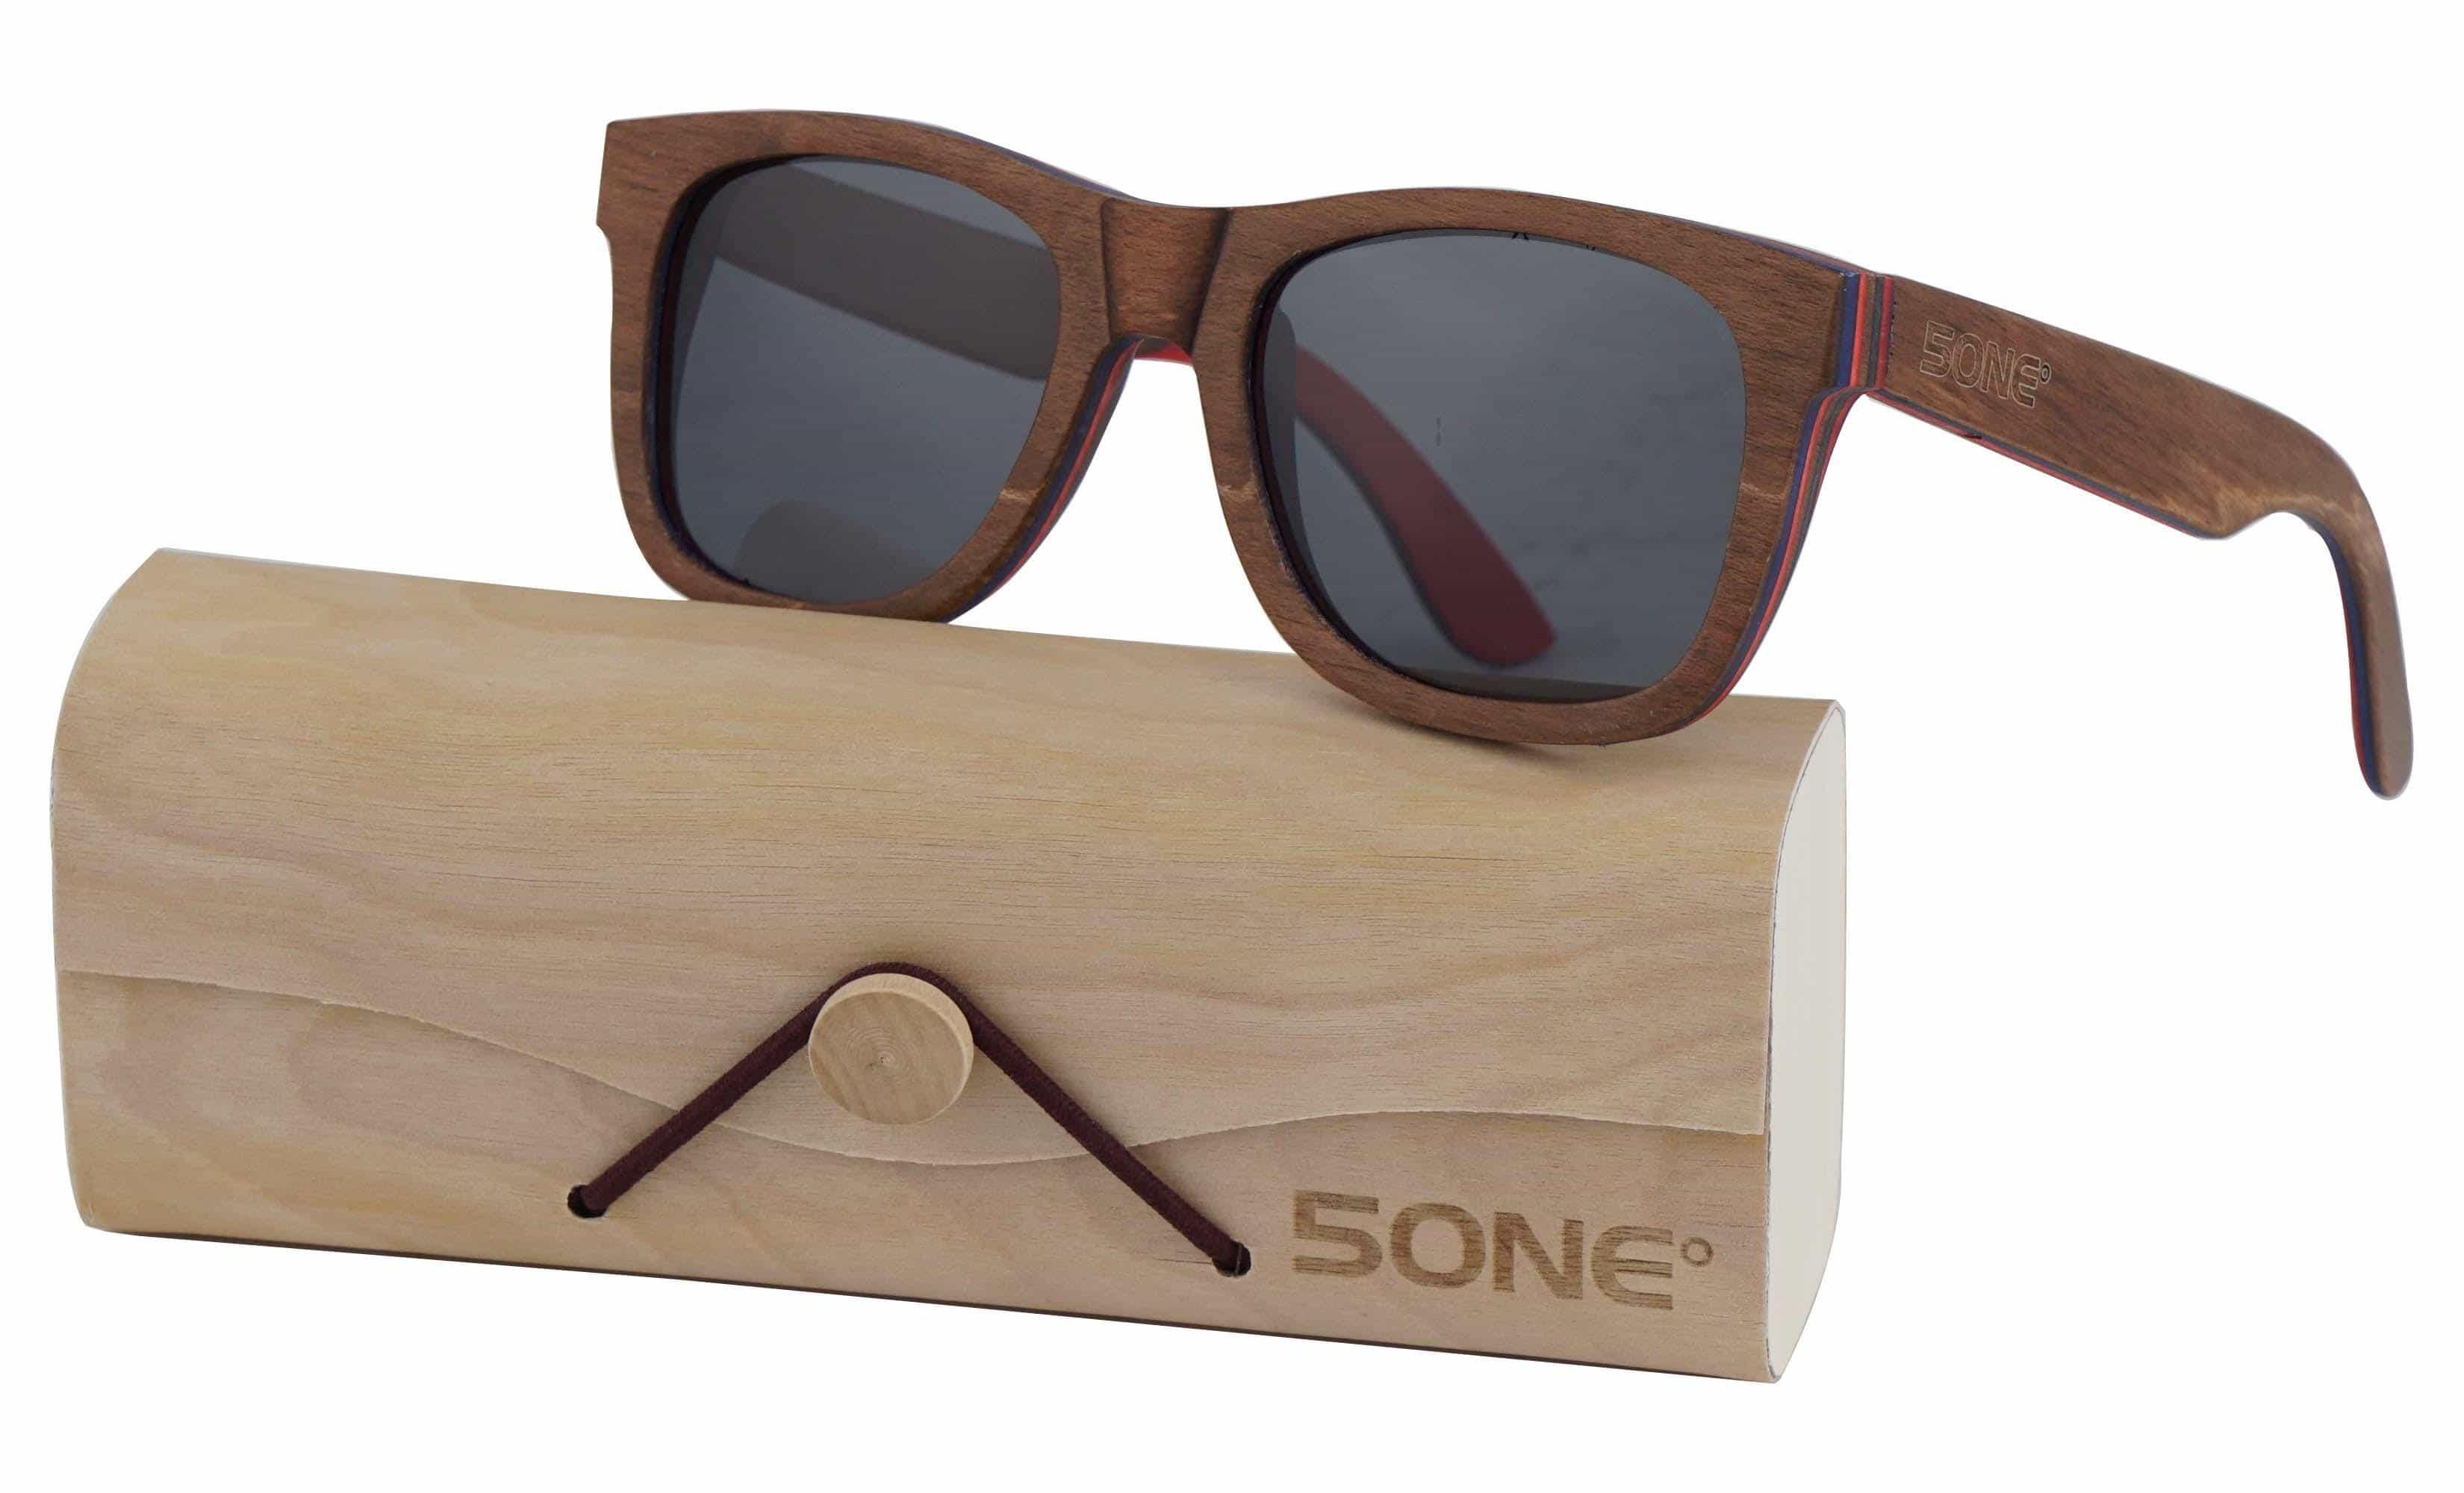 5one® Skateboard Brown - houten zonnebril Grijze lens